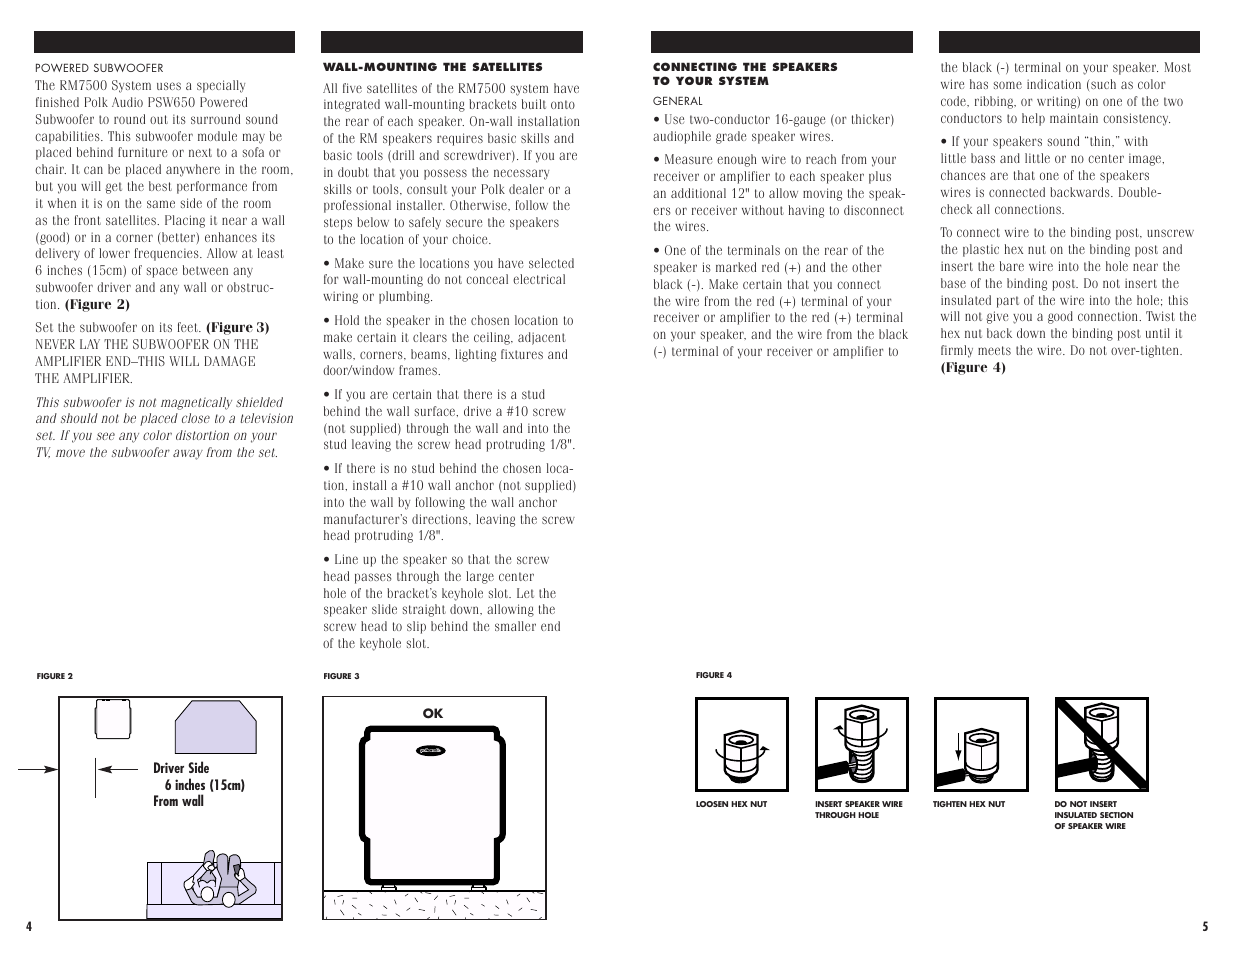 polk audio rm7500 user manual page 4 10 also for rmseries rm7500 rh manualsdir com